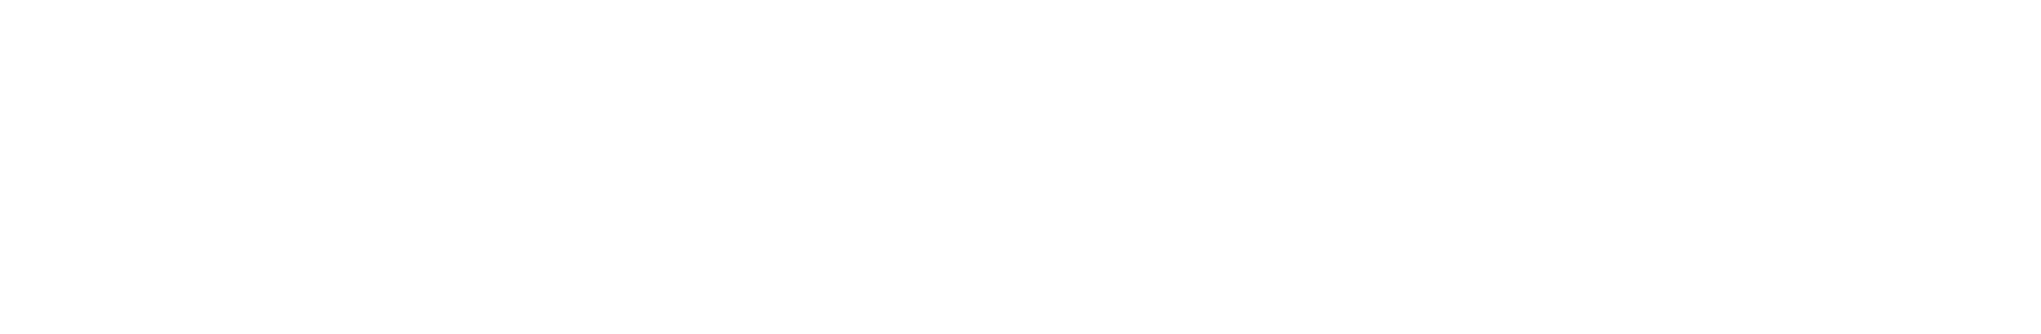 WH white logo.png